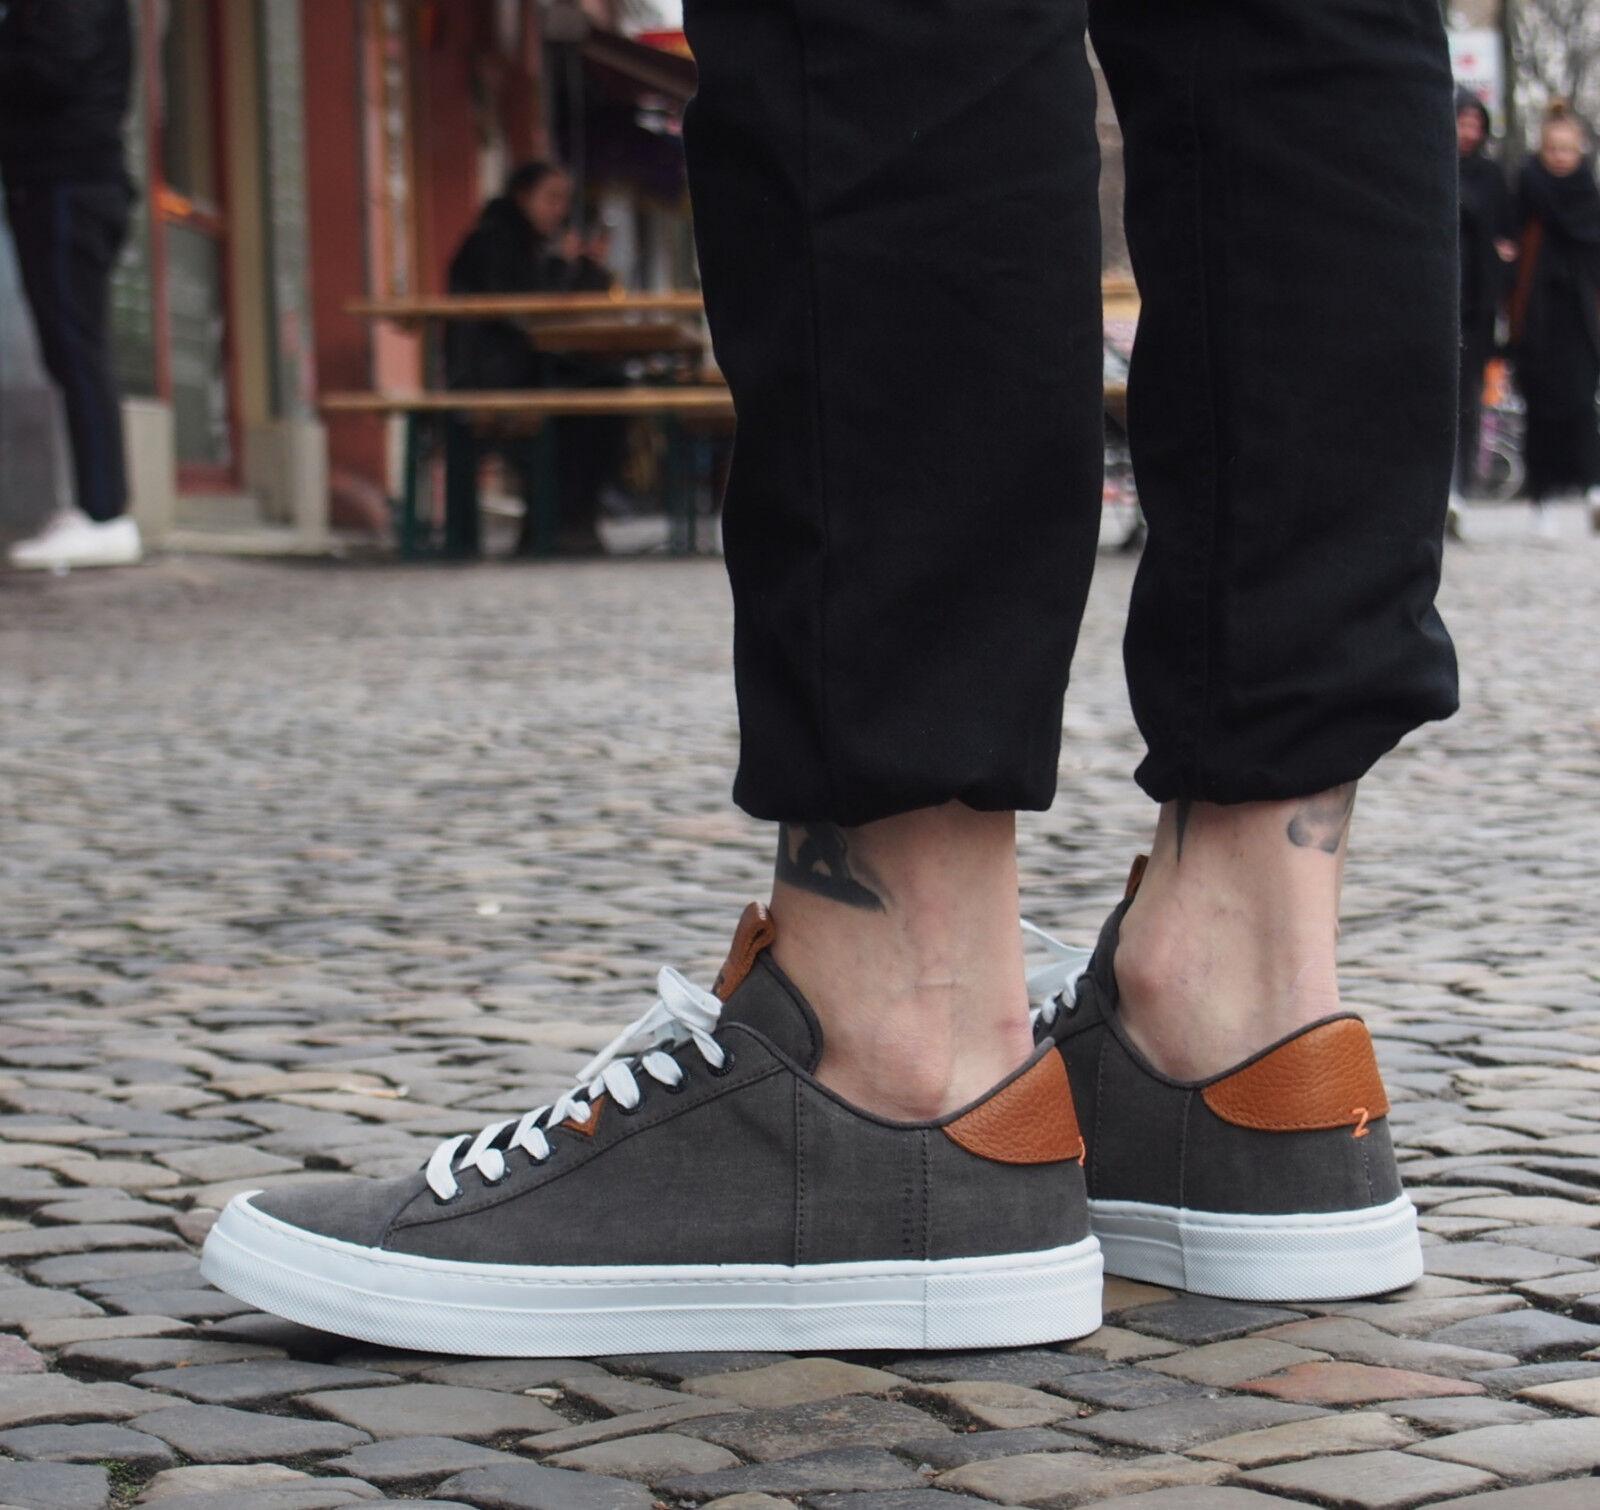 HUB Footwear Schuhe Hook-M C06 black/white Sneakers Herrenschuhe canvas NEU